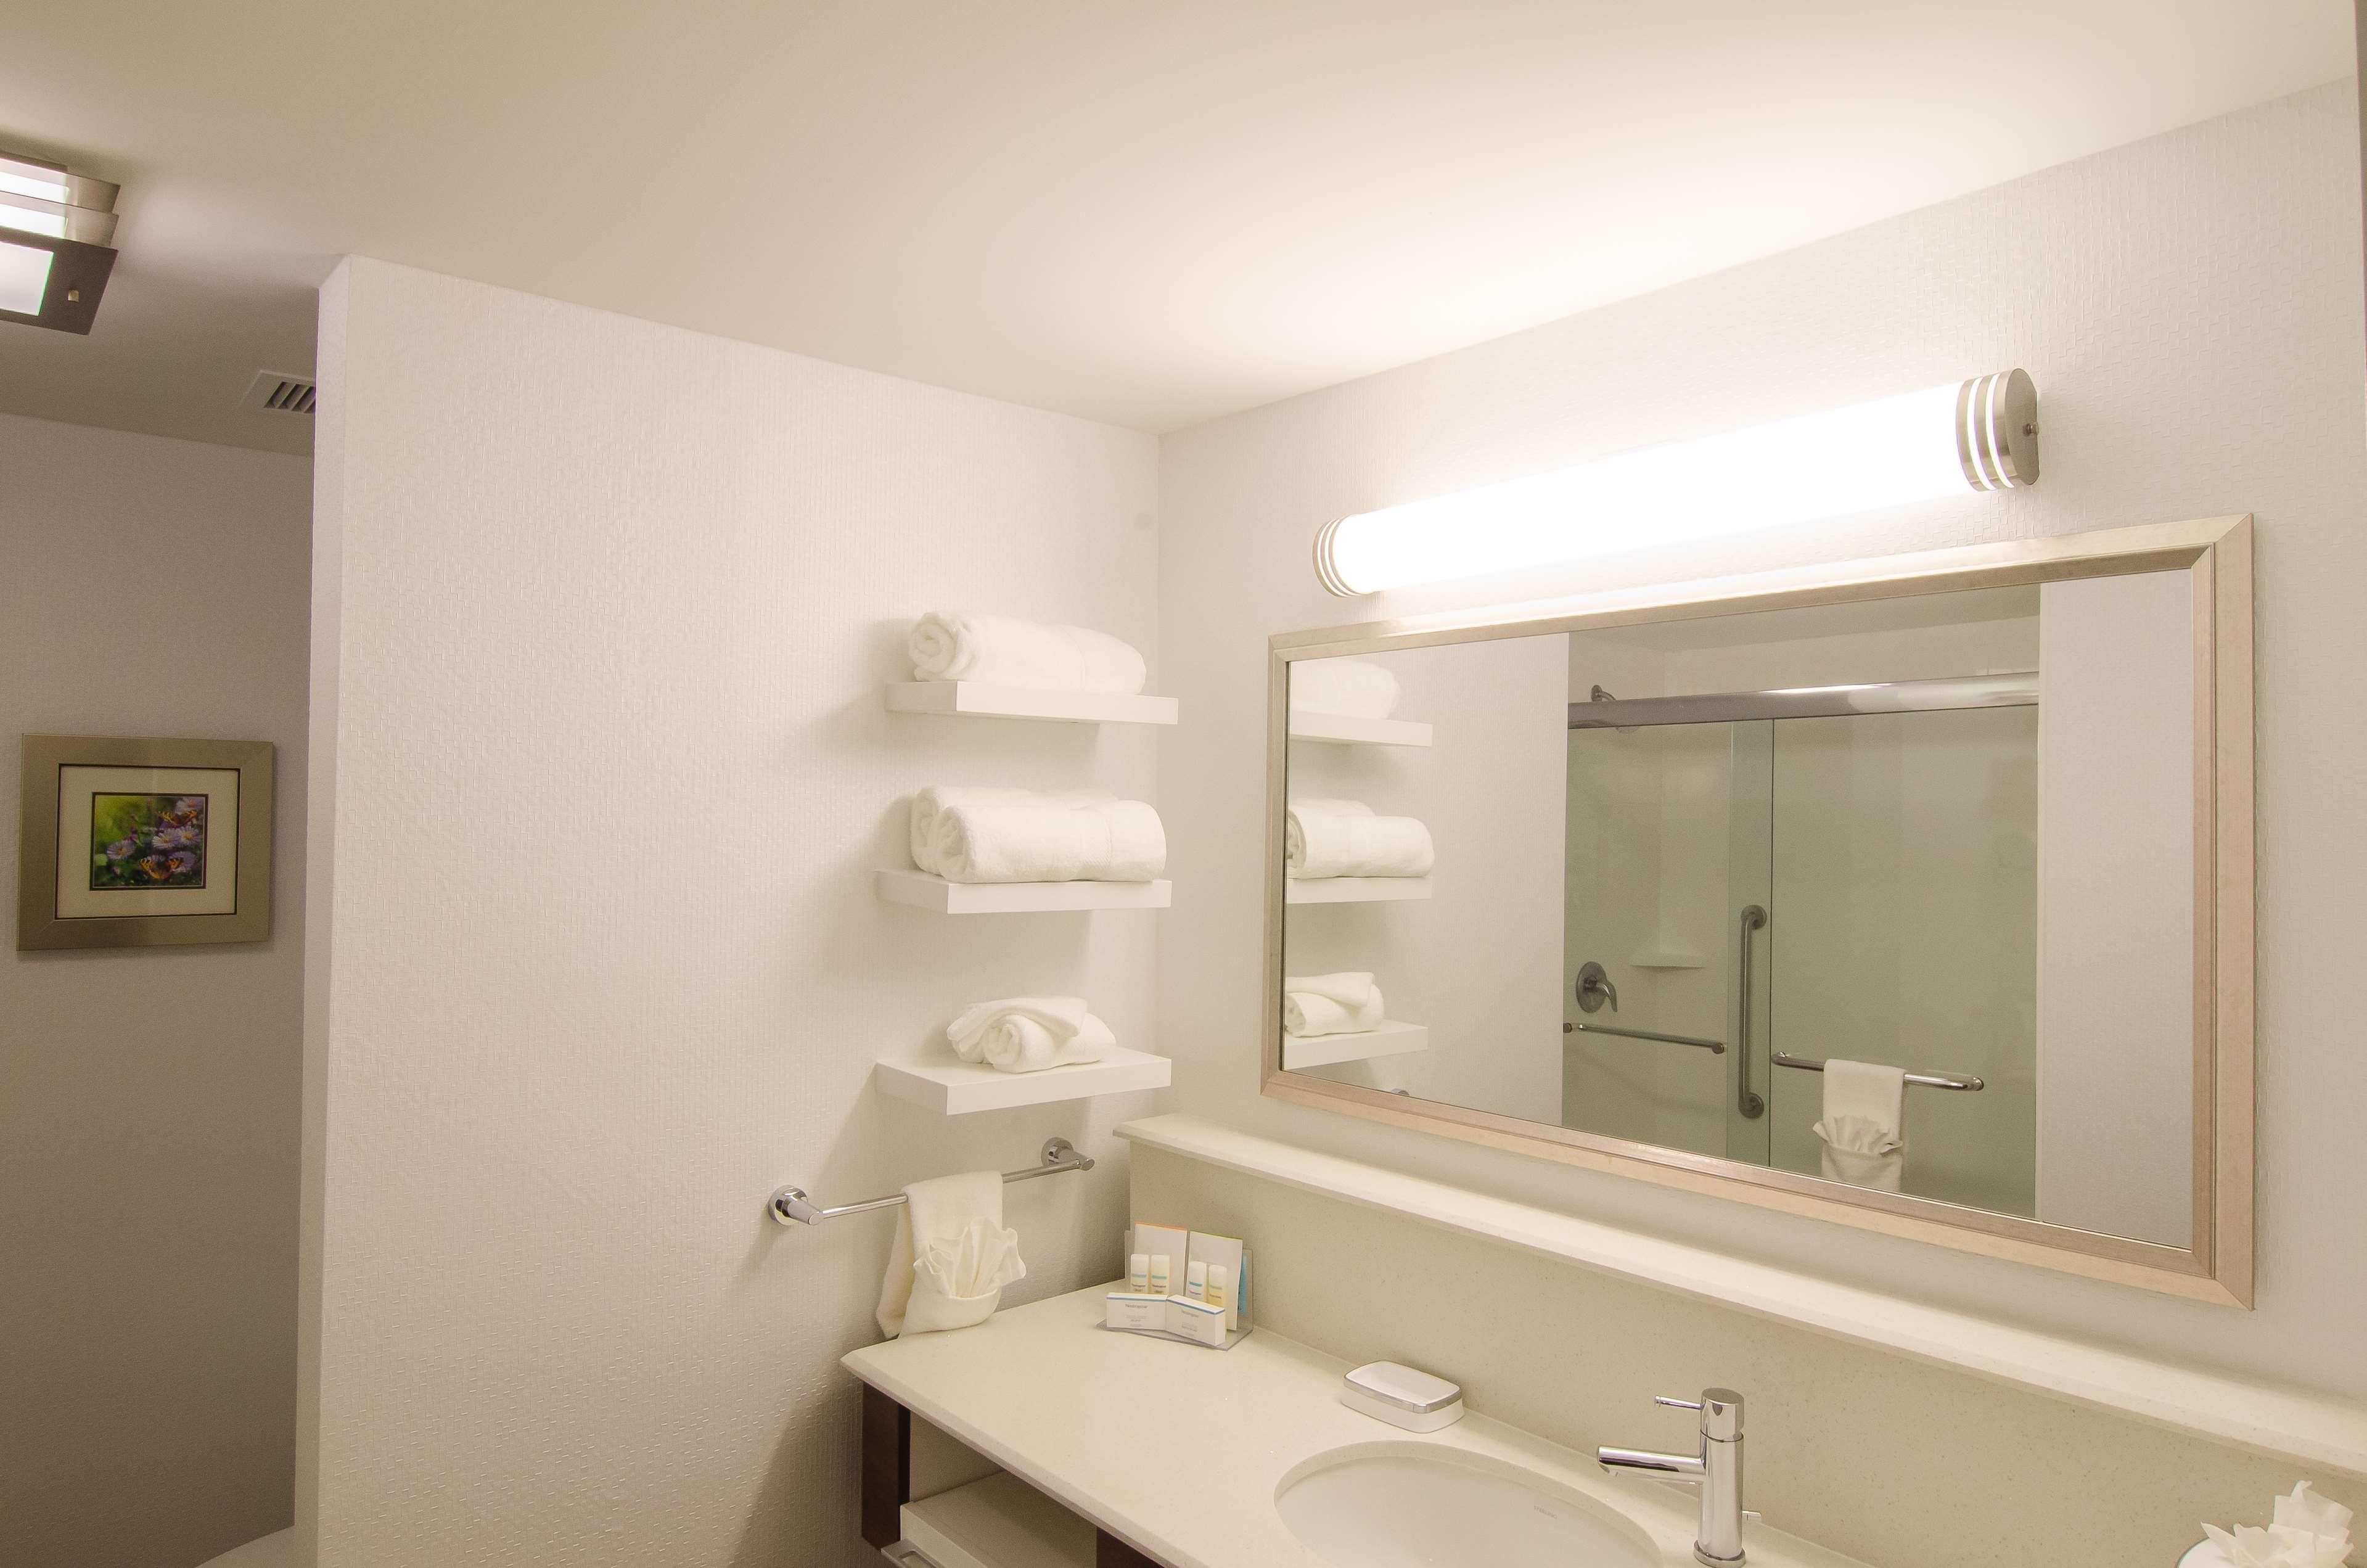 Hampton Inn & Suites Houston North IAH image 19